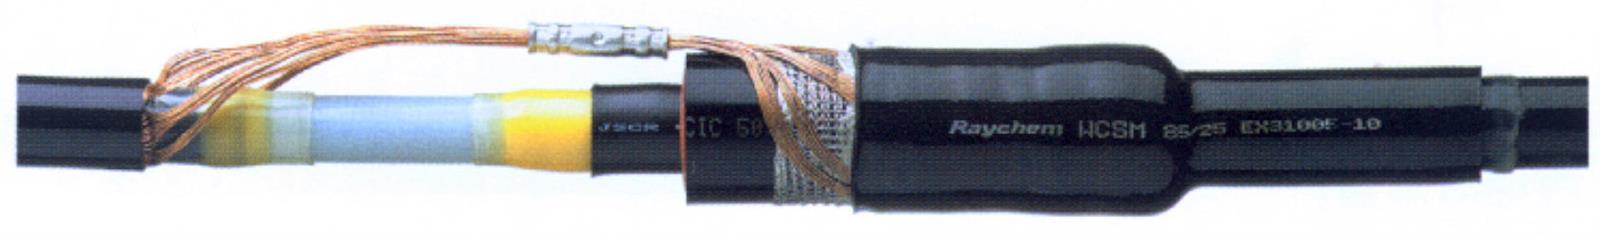 KABELSKARV SXSU 6132